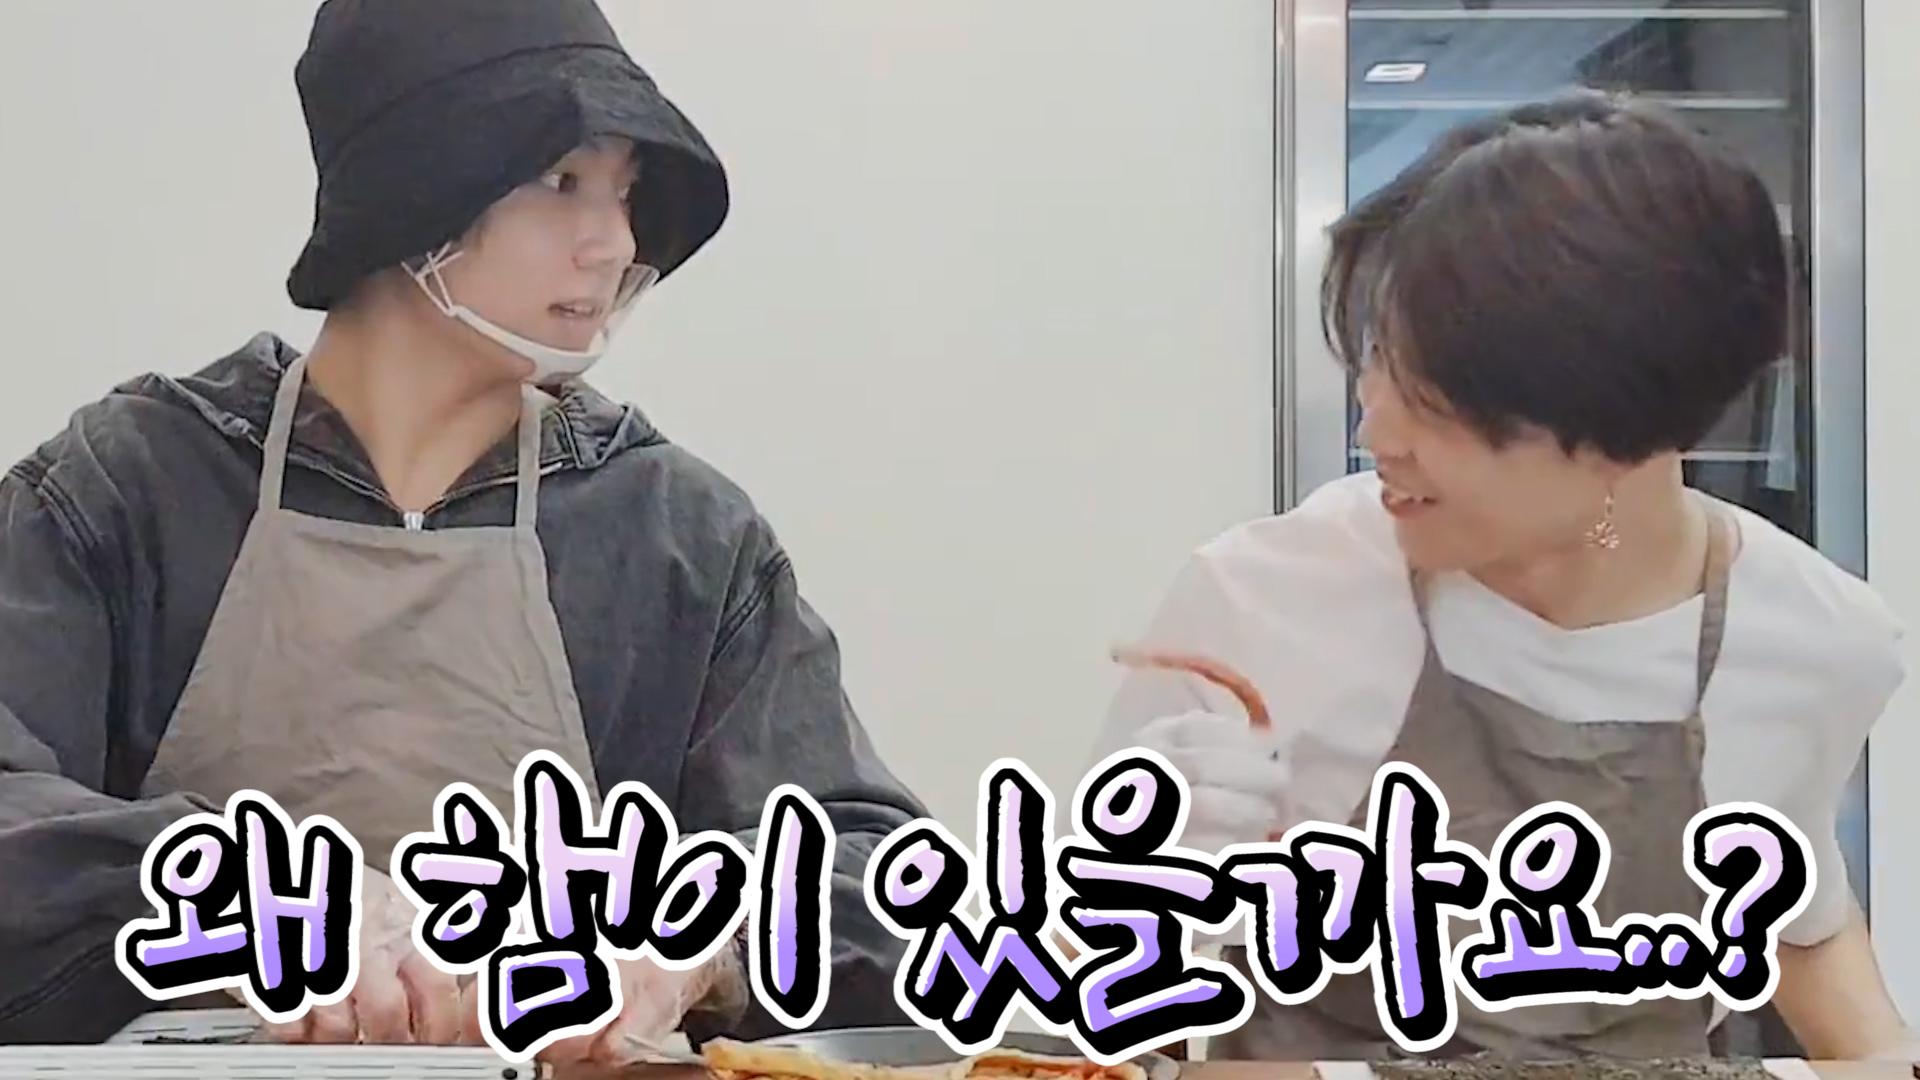 [BTS] 🎬꿈이 현실인지 현실이 꿈인지 <햄셉션> 대개봉‼️ (Jungkook&Jimin making Gimbap)